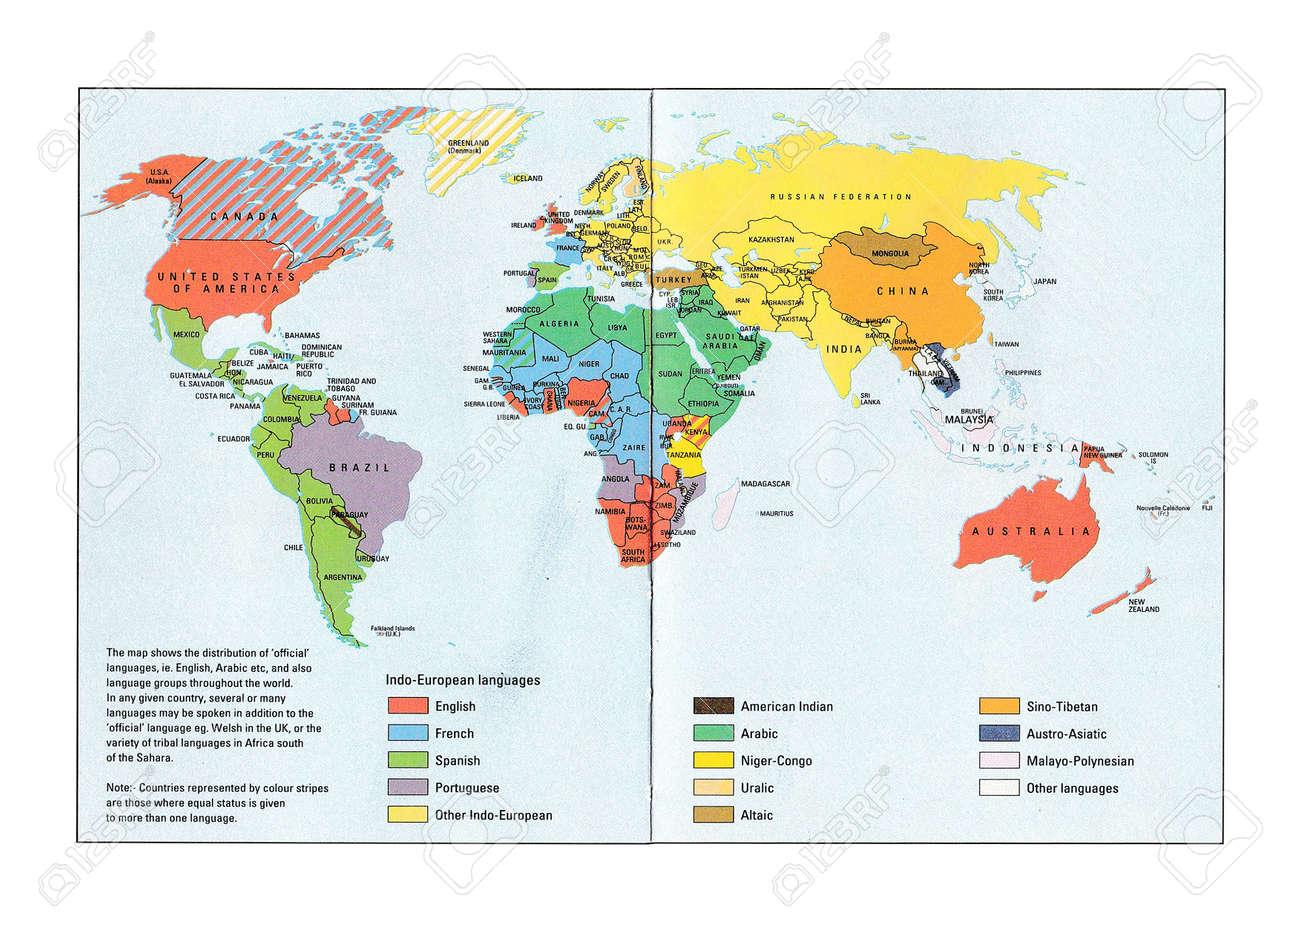 Chiang Mai THAILANDFebruary Map Of The World Language - World languages map